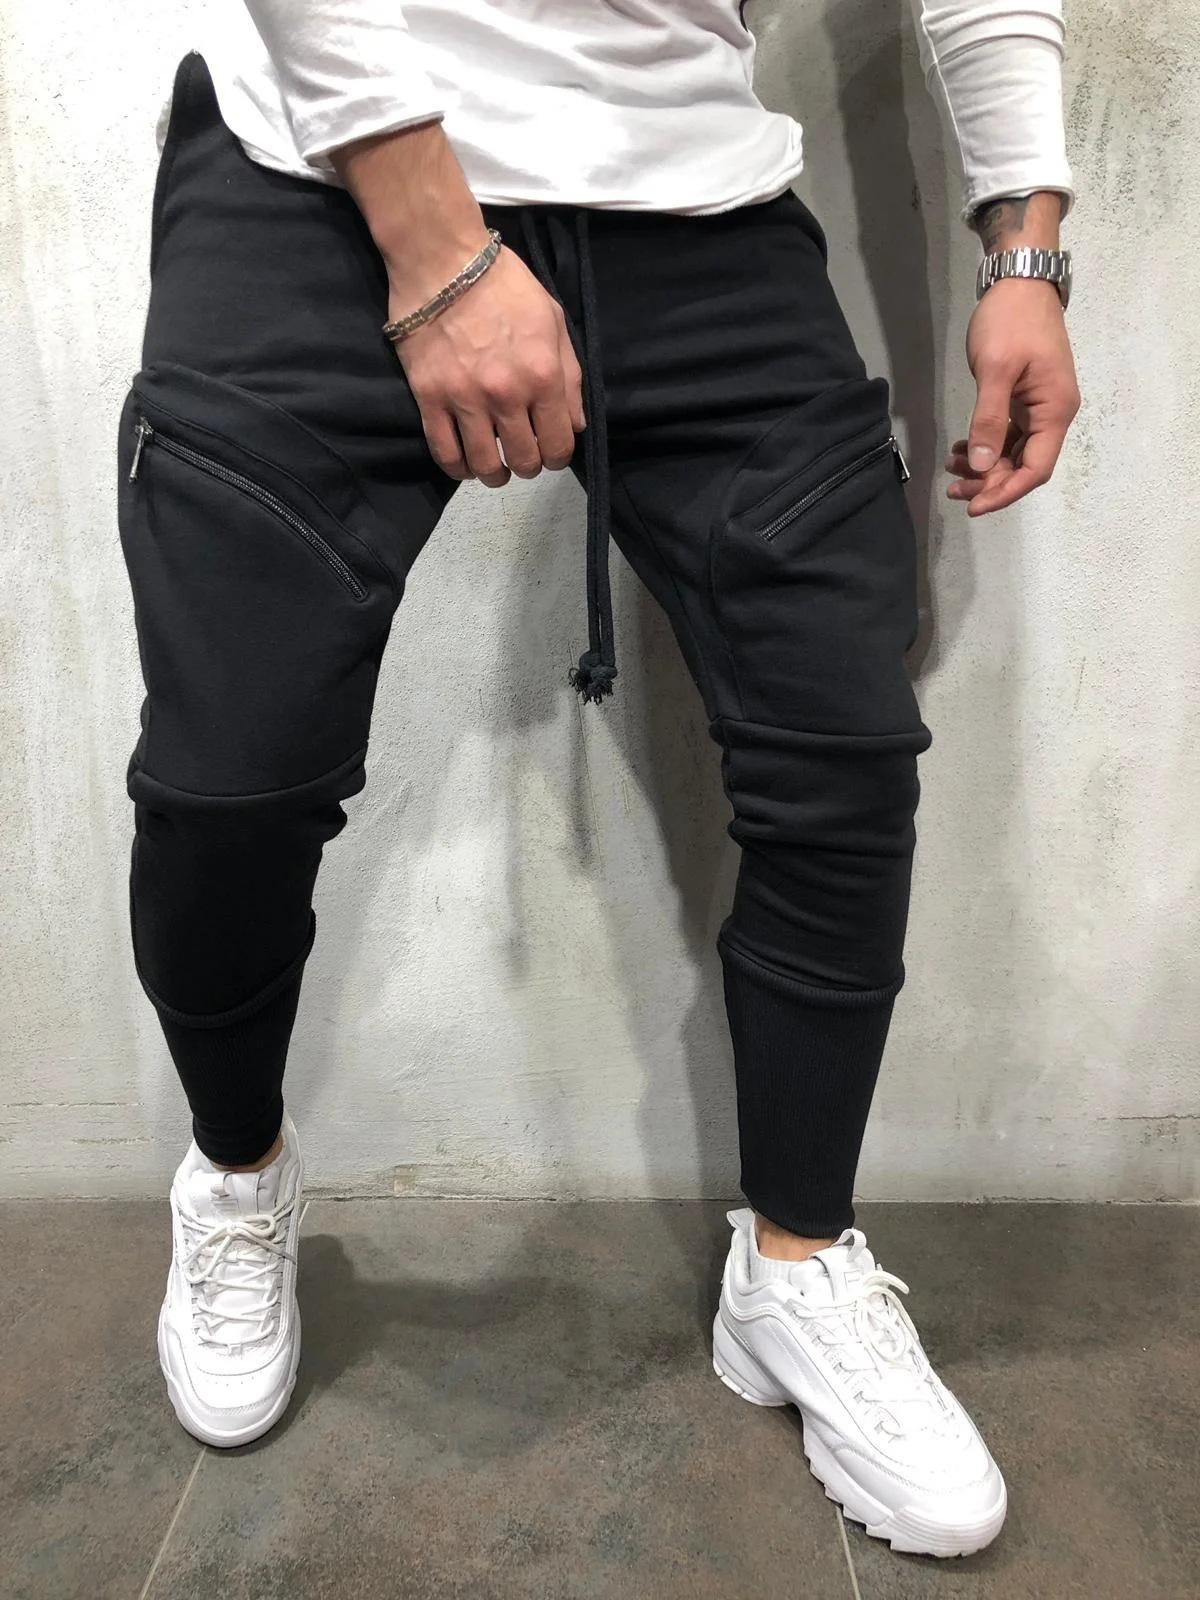 LW COTTON Men Casual Pocket Design Drawstring Black Pants